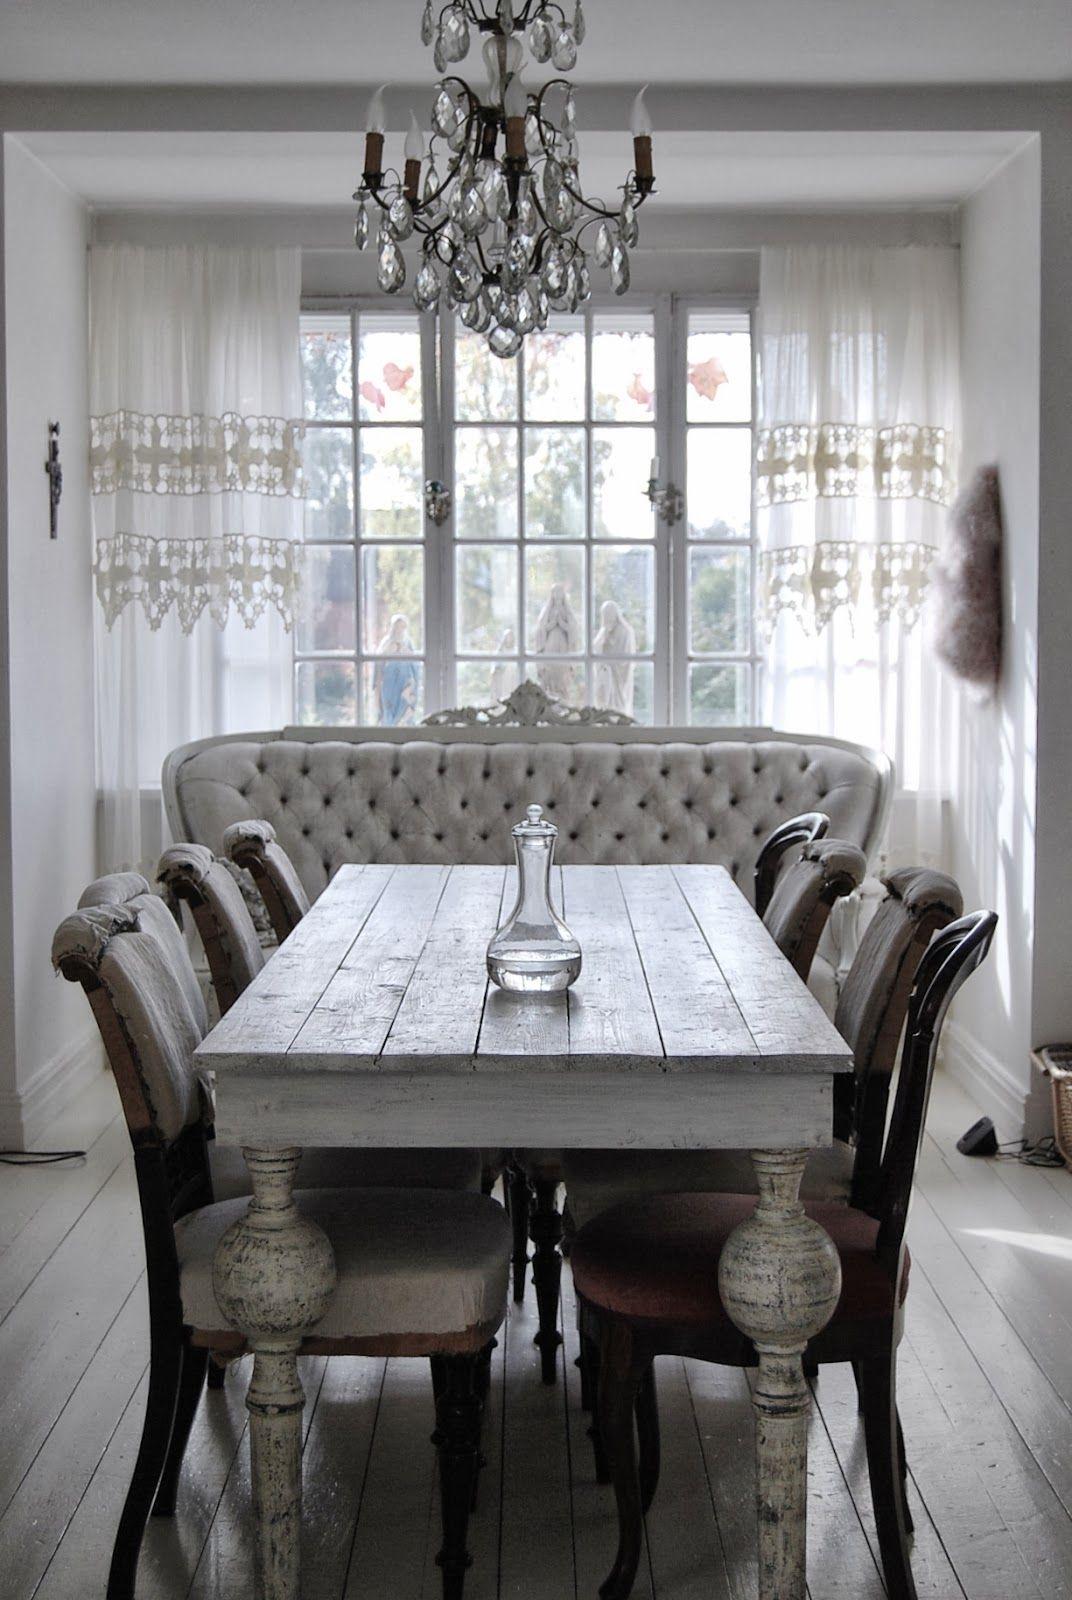 Pin de Bailey Bramlett en Dining Room | Pinterest | Comedores, Mesa ...